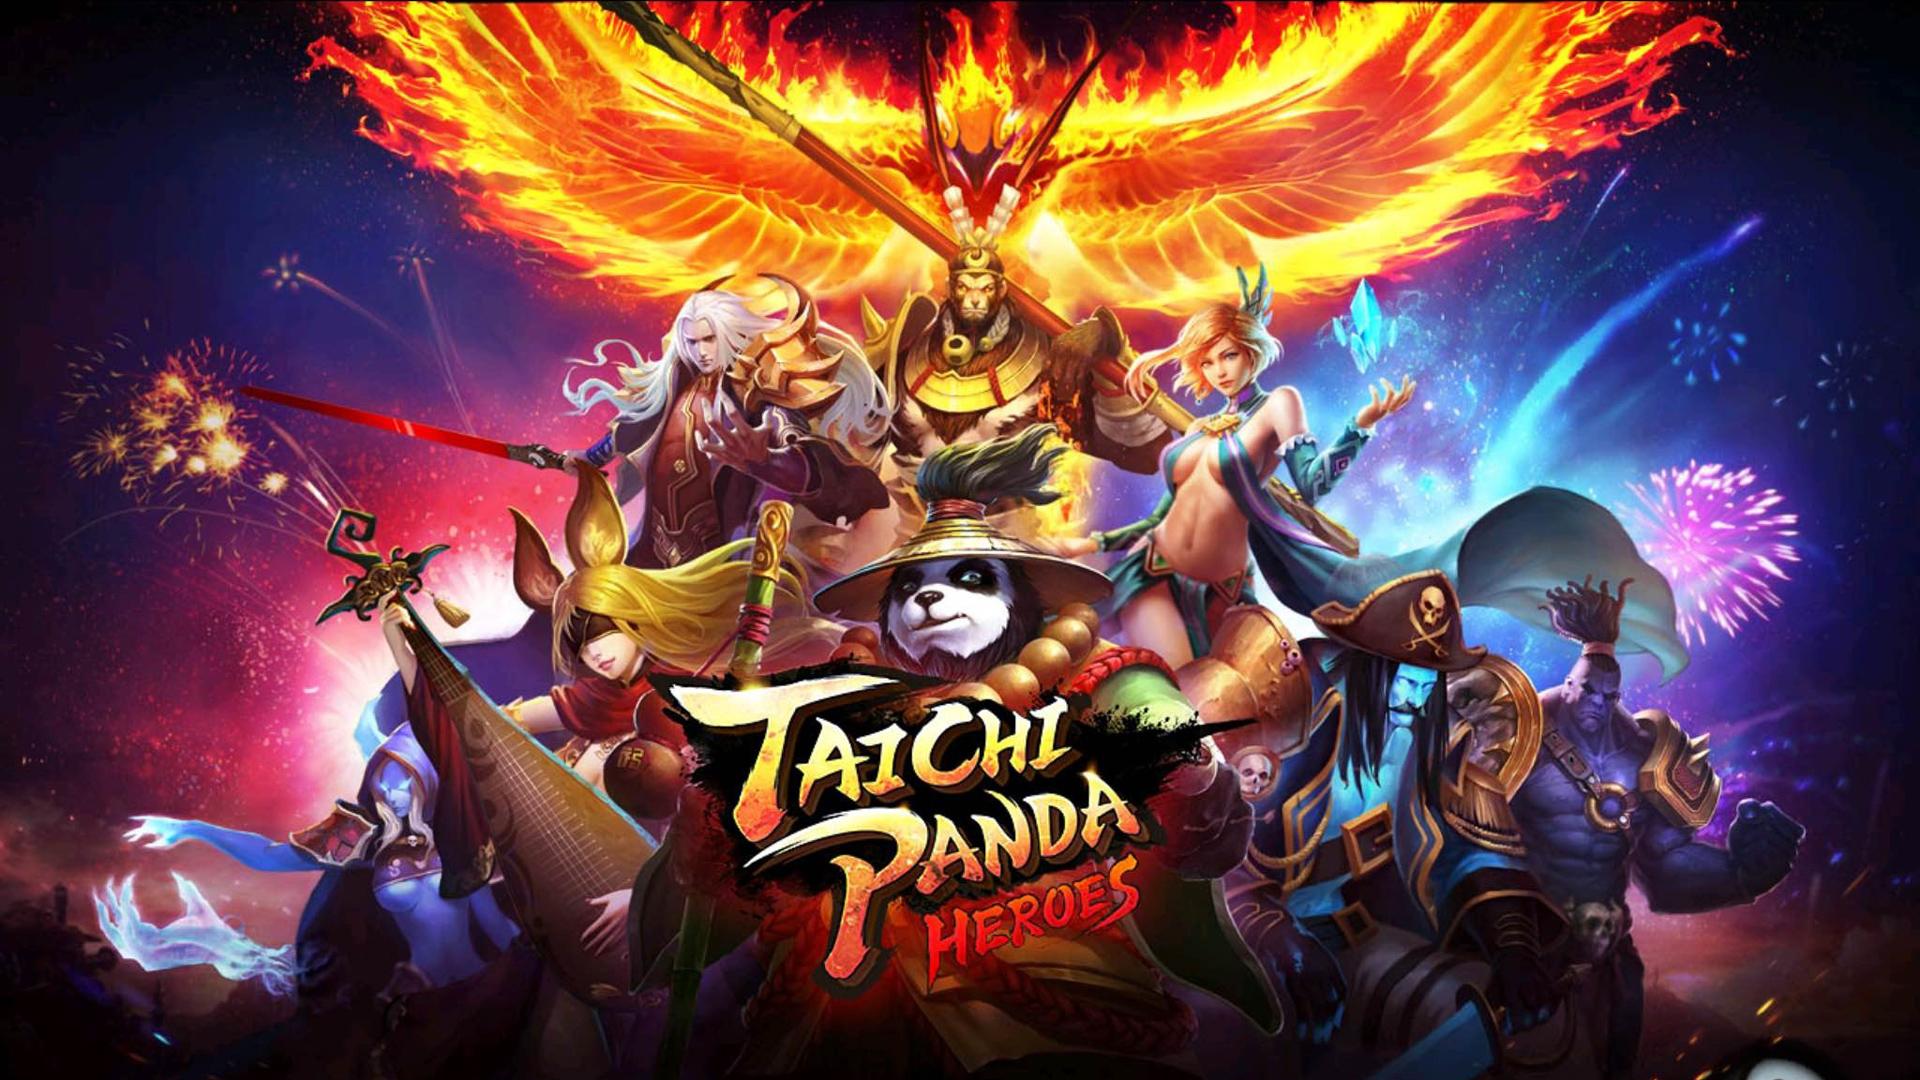 Taichi Panda Heroes CB Preview